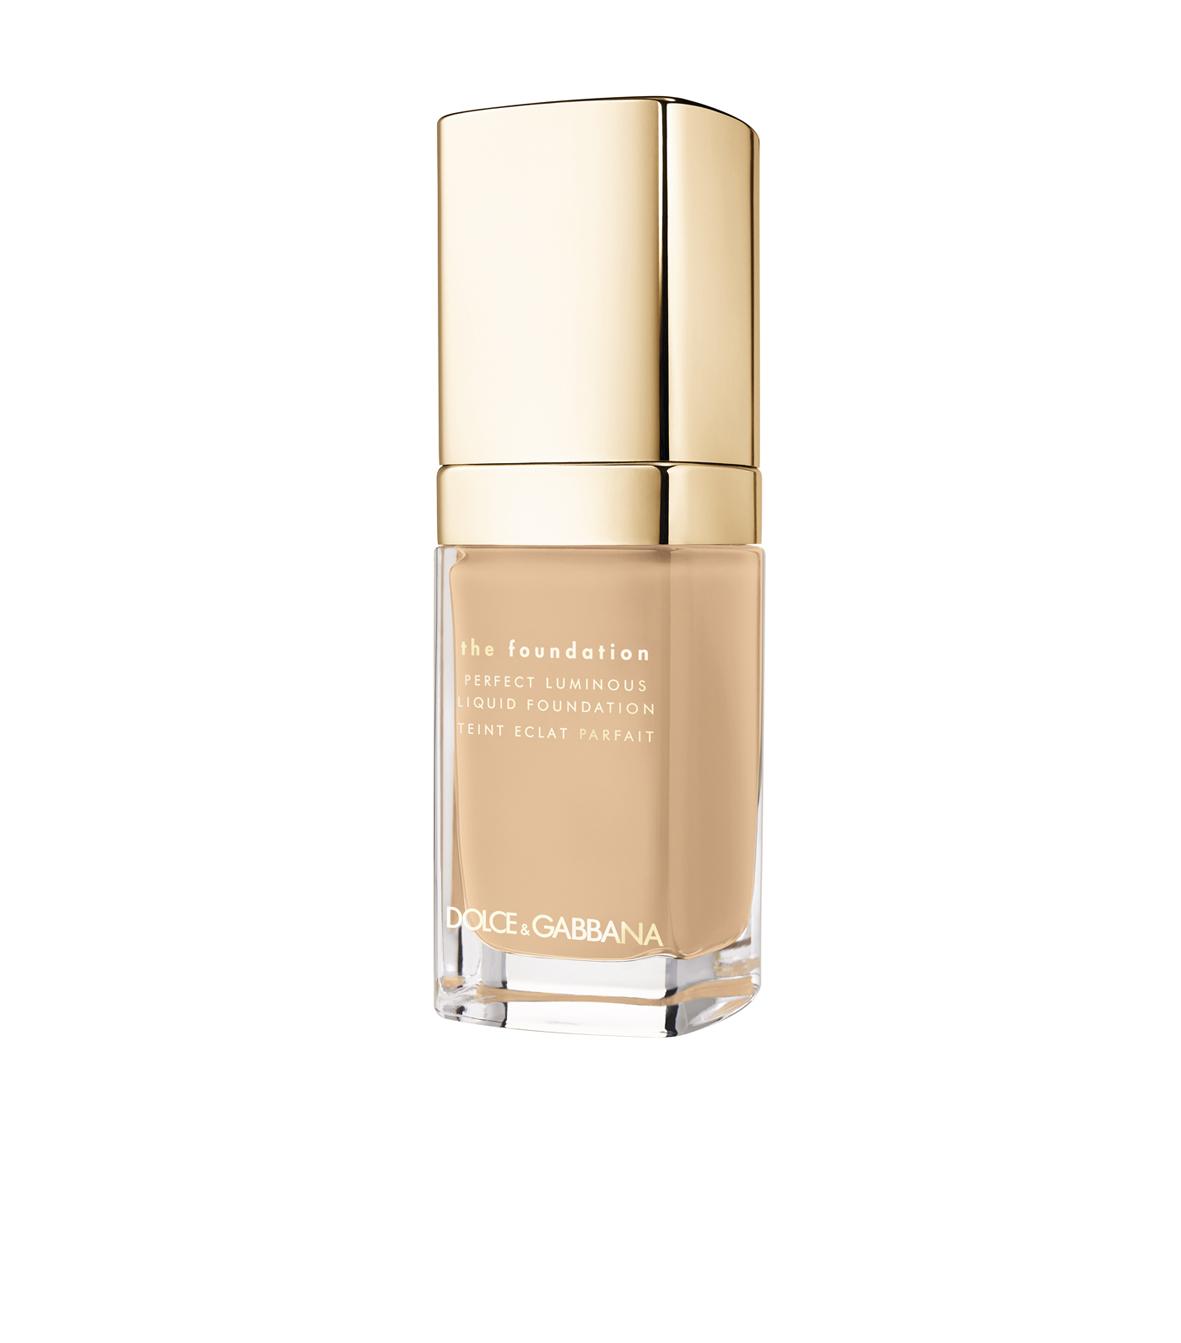 Dolce&Gabbana, Perfect Luminous Liquid Foundation in Beige